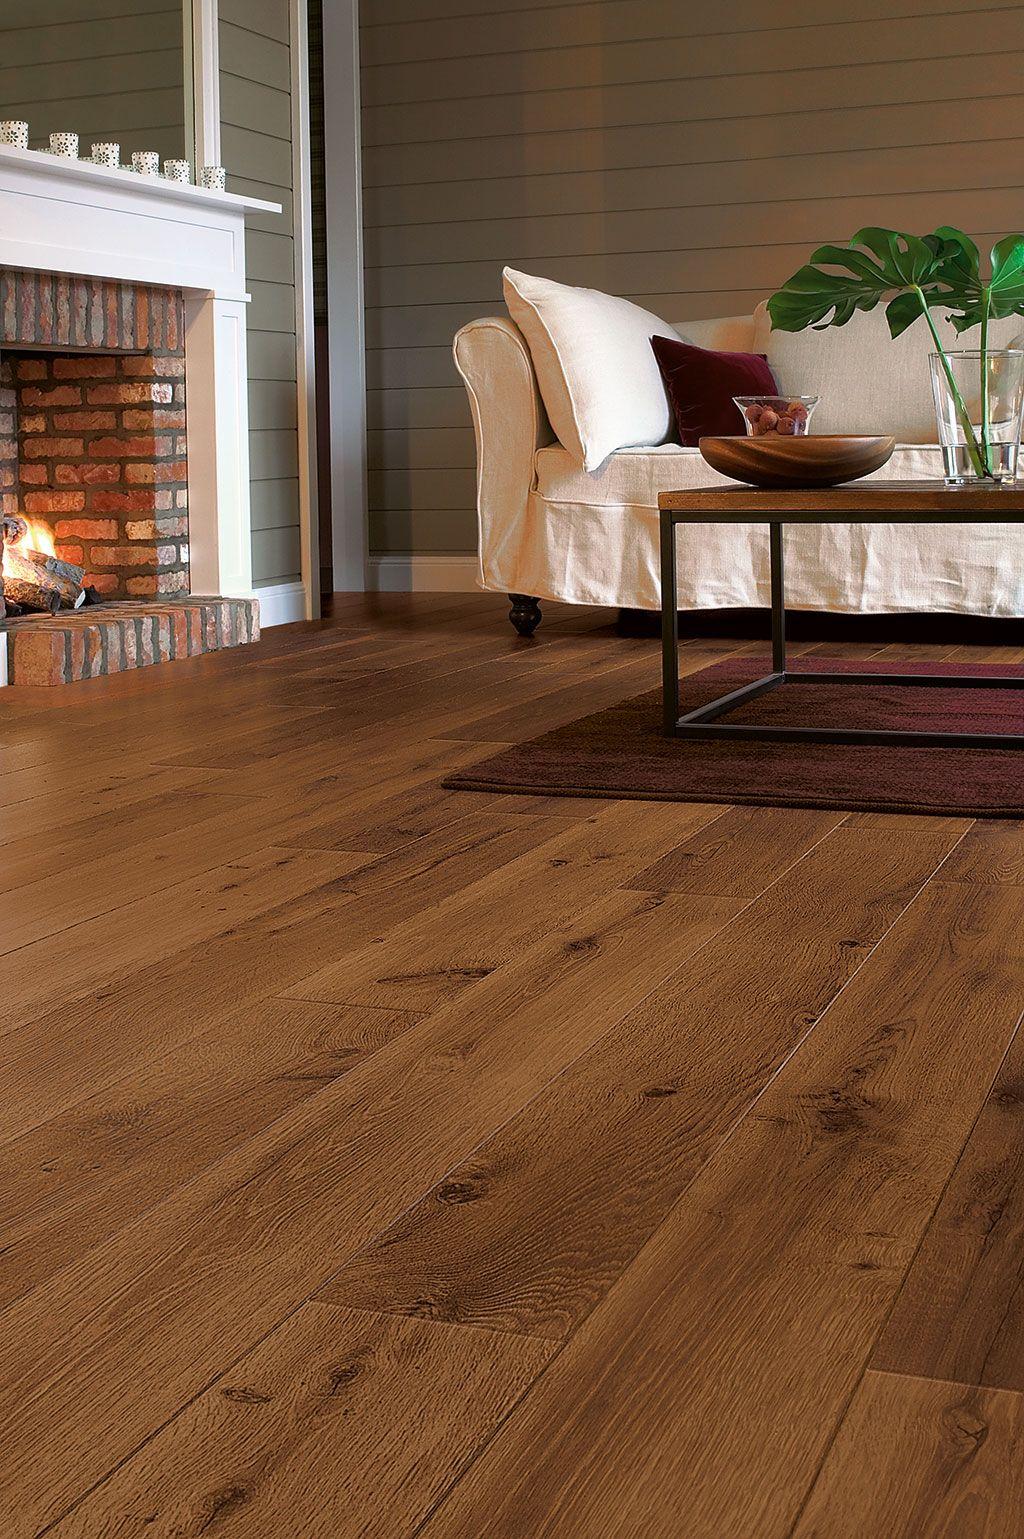 QuickStep Laminate Flooring Perspective 'Vintage oak